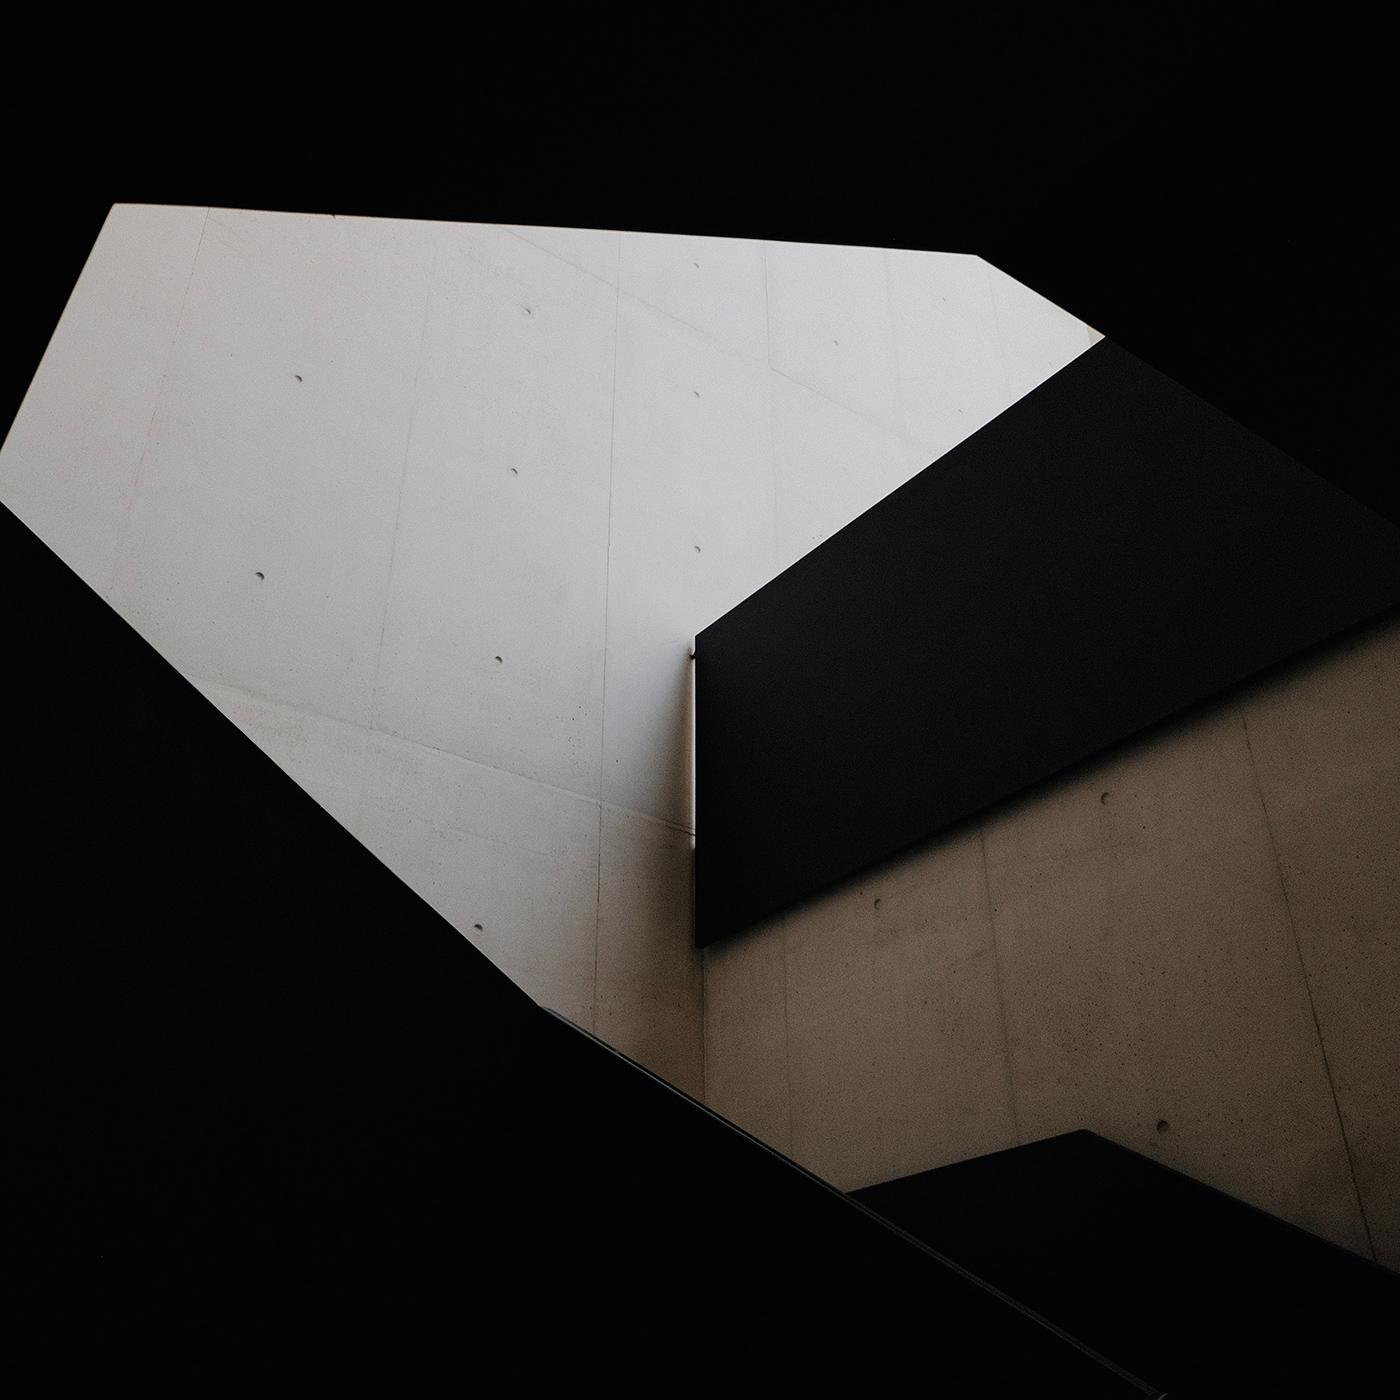 Modernist concrete building interior